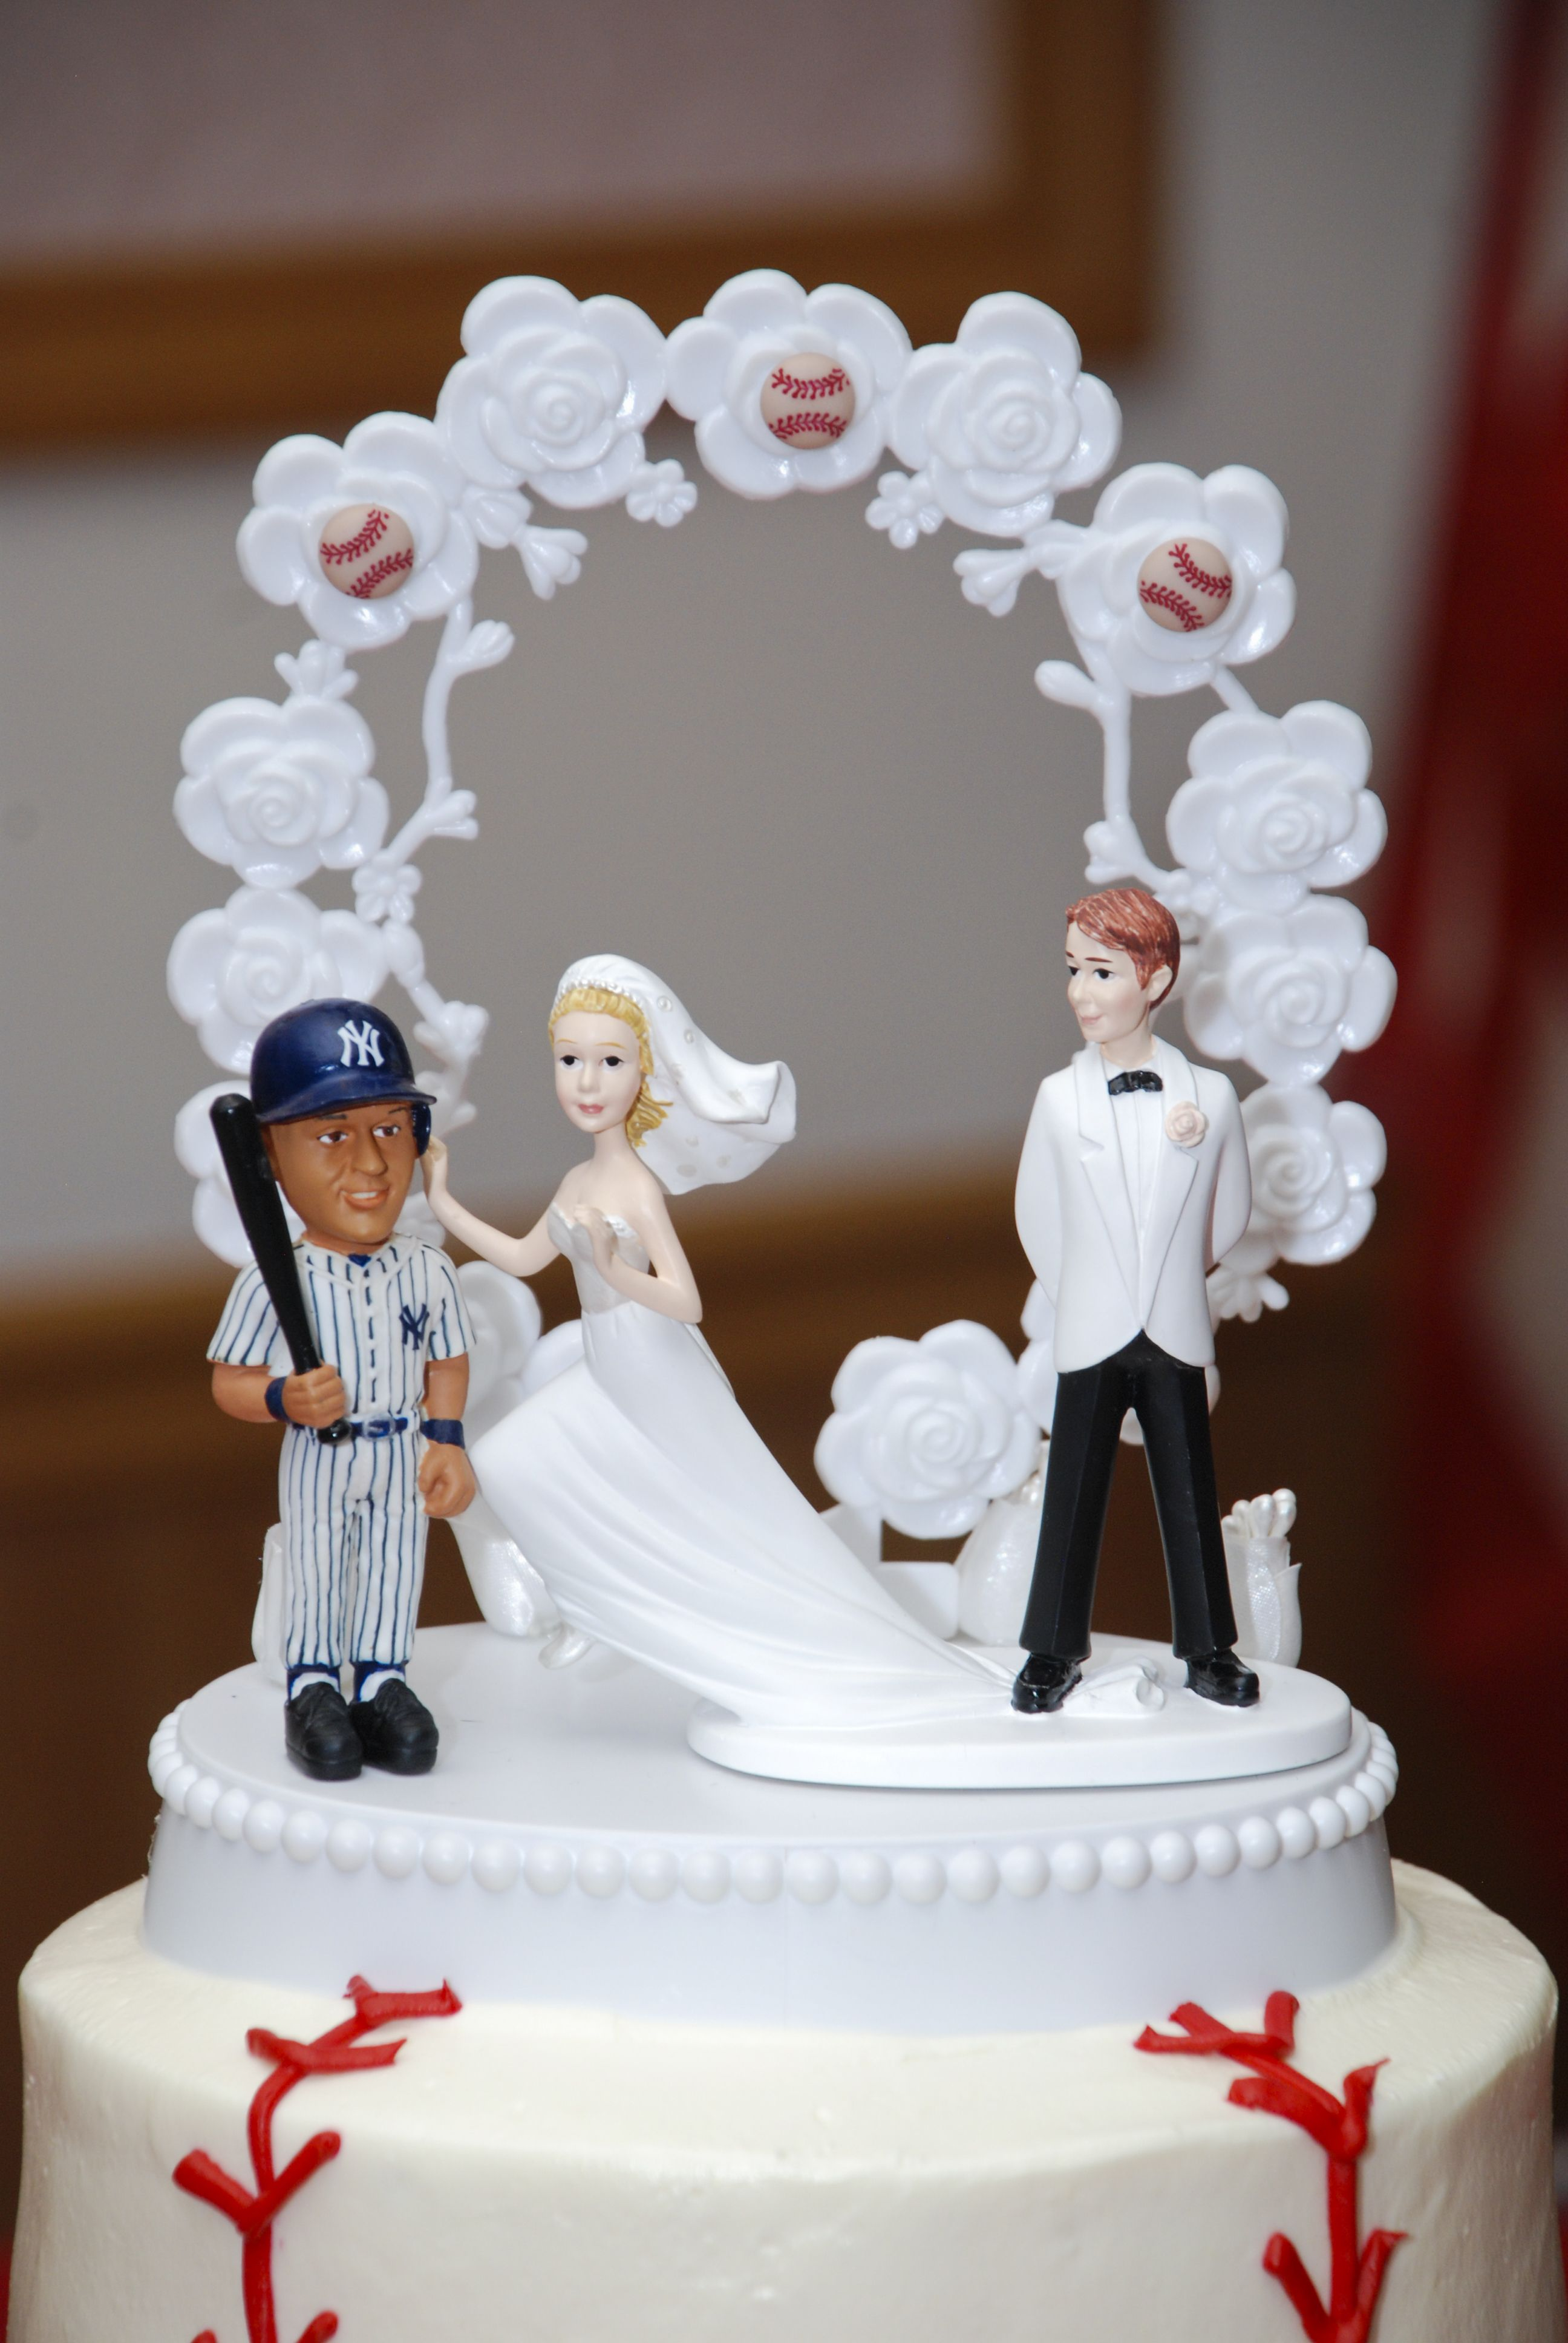 Pin By Bryan Chin On That S How We Roll Baseball Wedding Cakes Baseball Wedding Derek Jeter Yankees